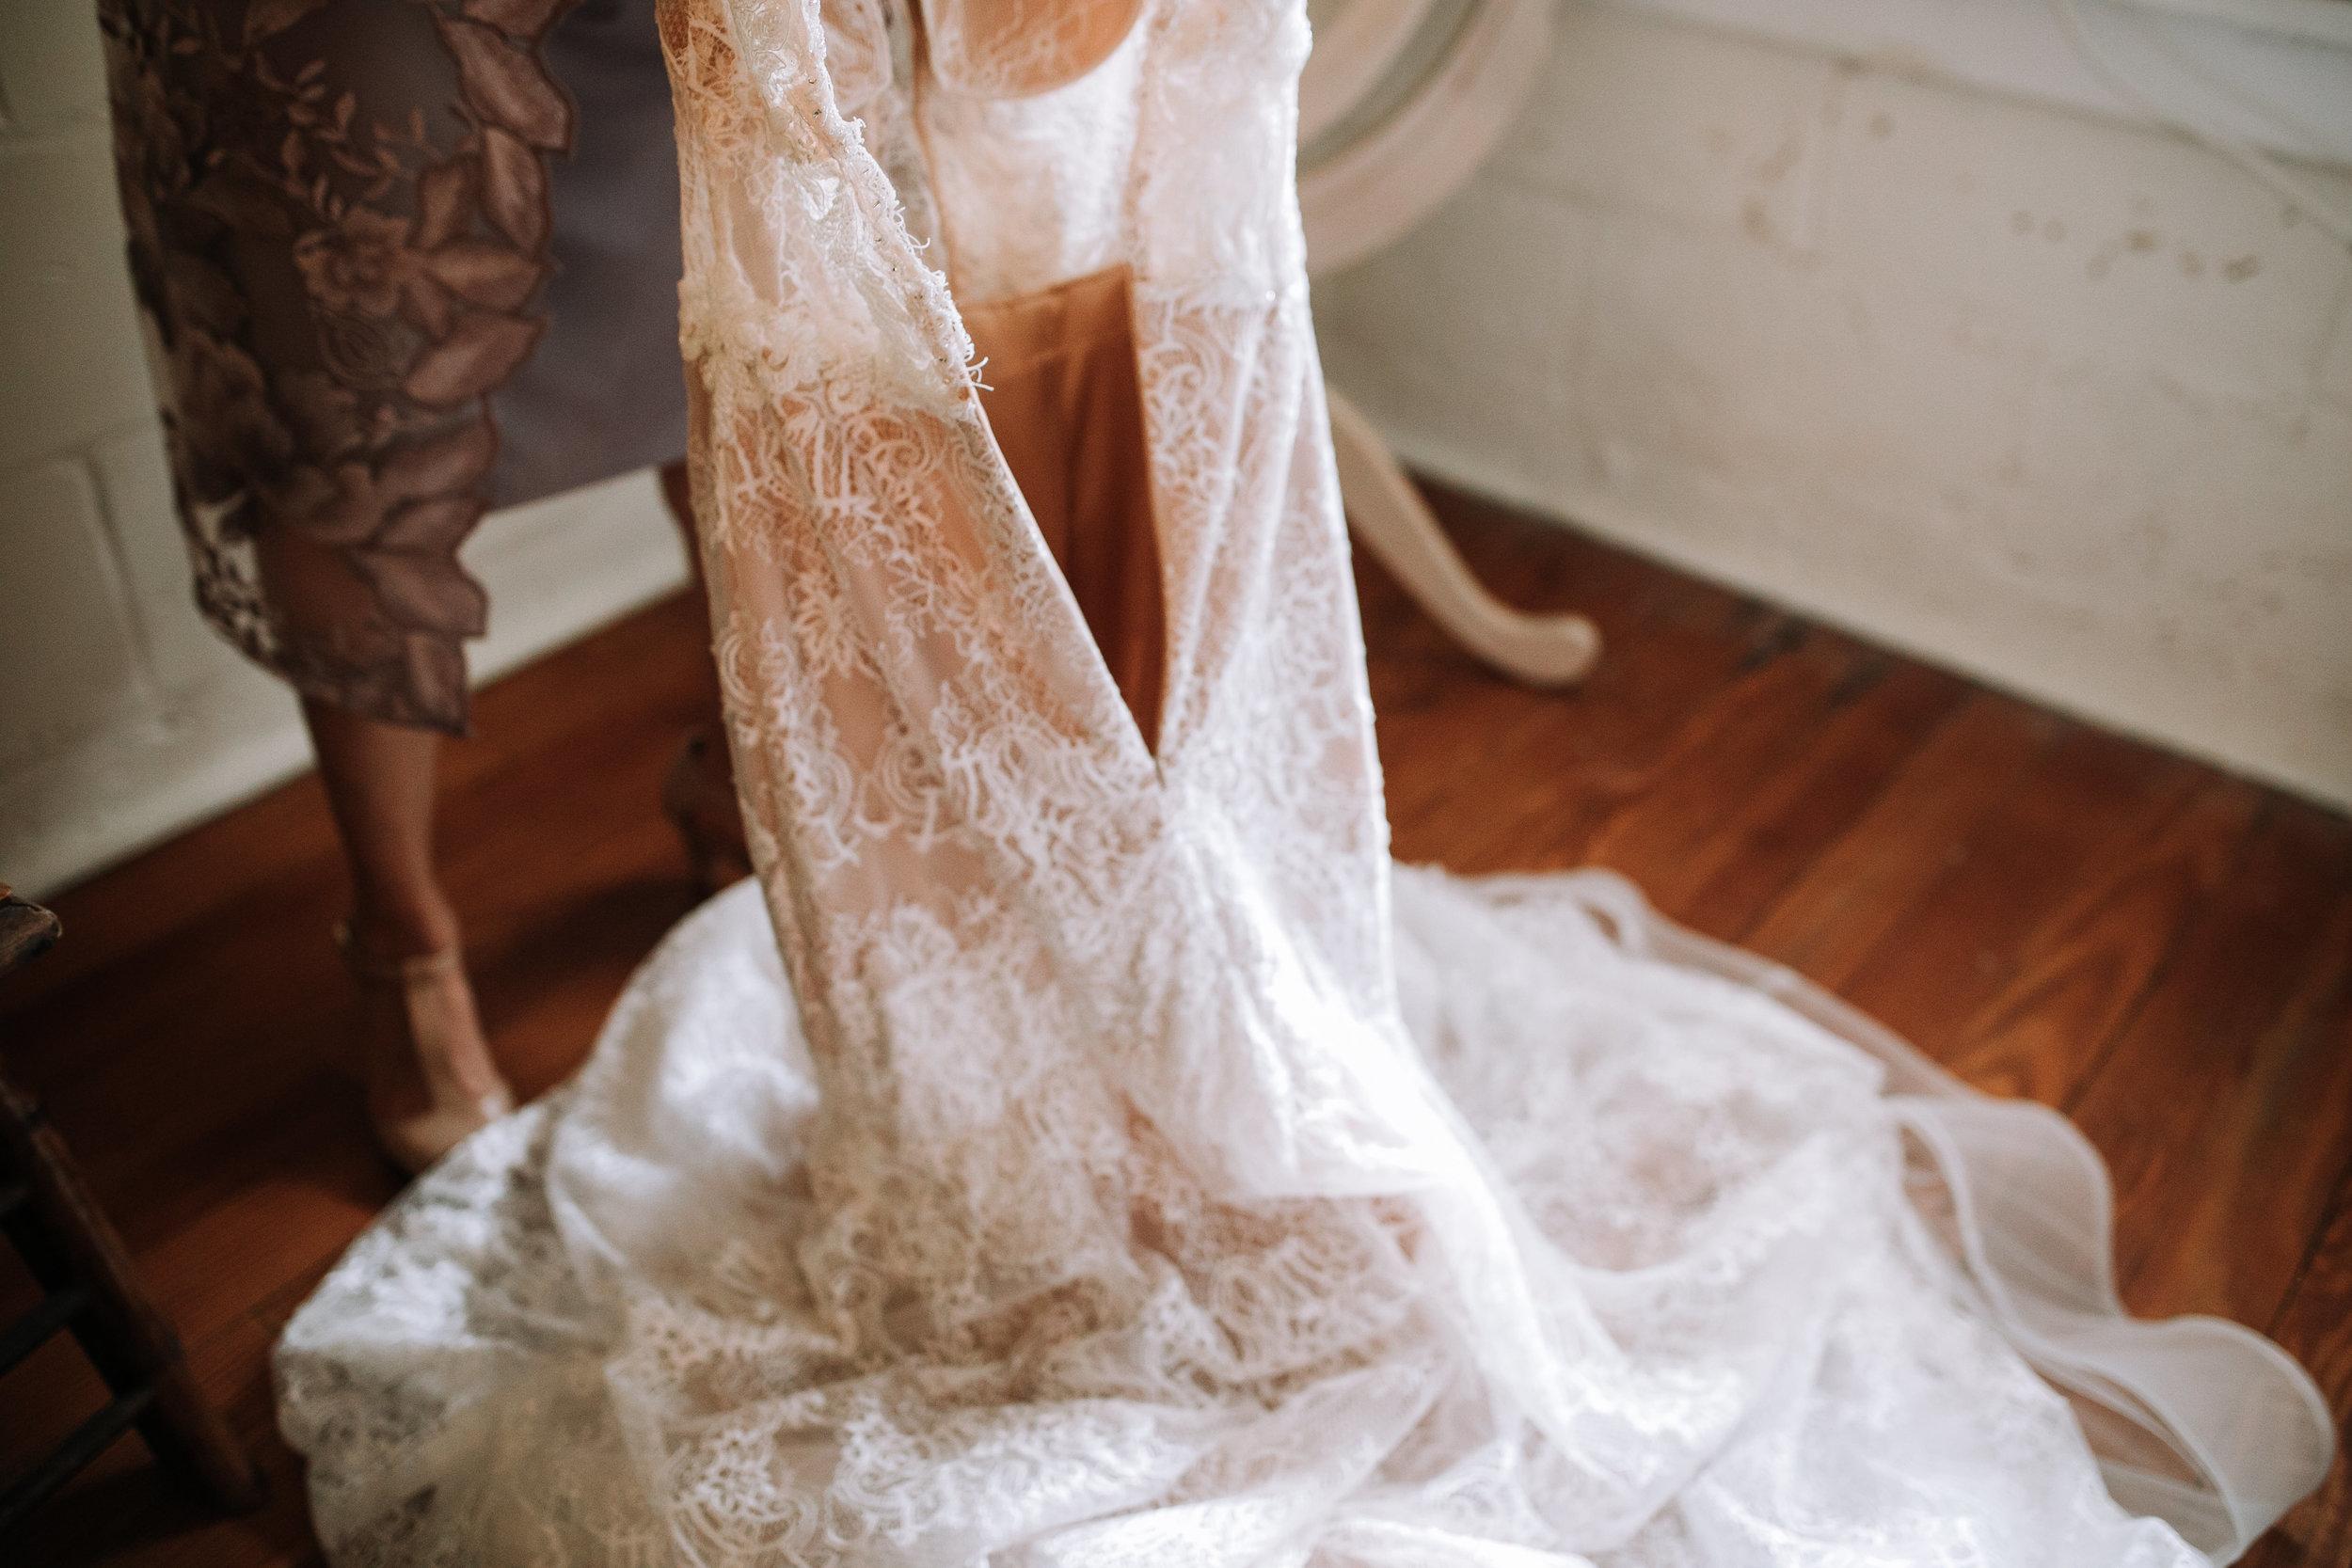 Bonett-House-wedding-gown-picture